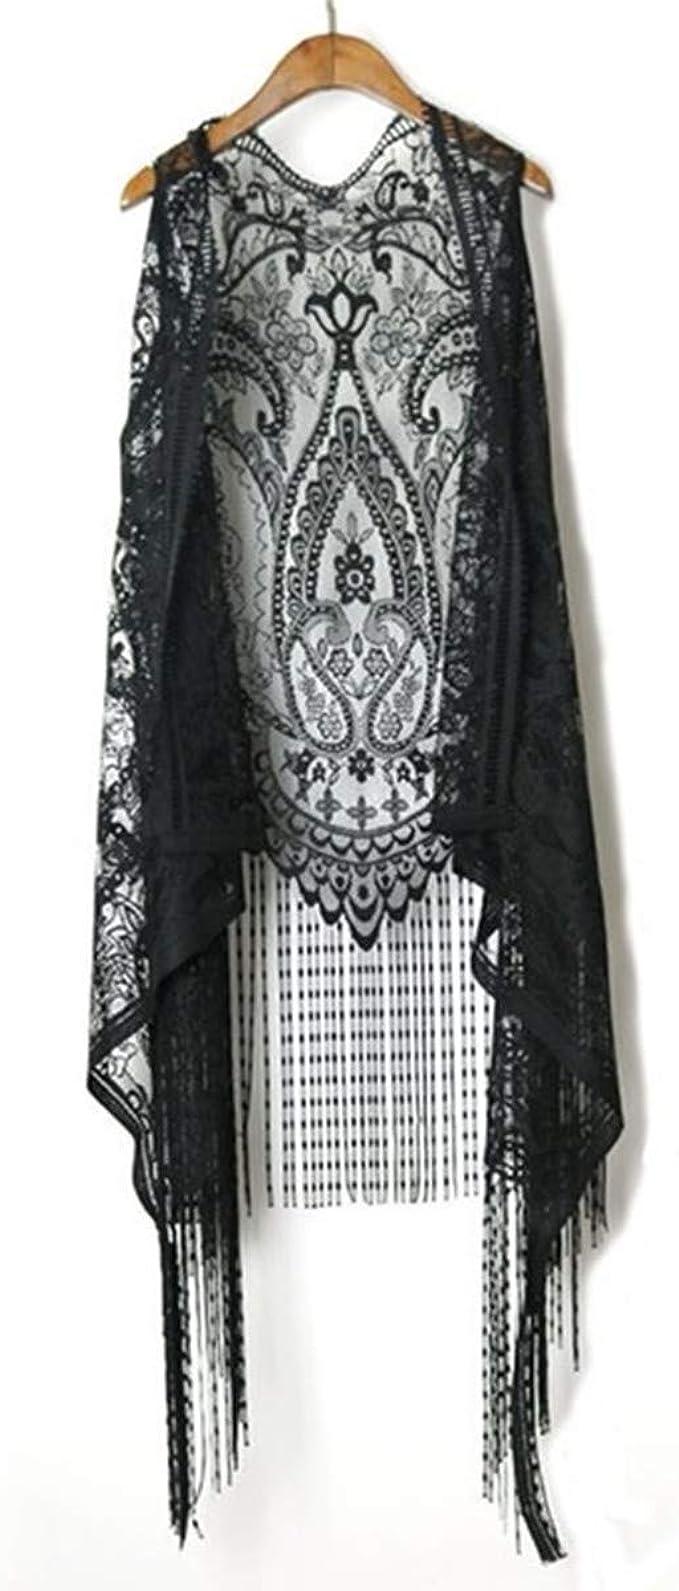 Hippie Dress | Long, Boho, Vintage, 70s Sexy Lace Cardigan Women Vest Casual Hollow Out Perspective Plus Size Irregular Long Beach Elegant Tops Waistcoat  AT vintagedancer.com